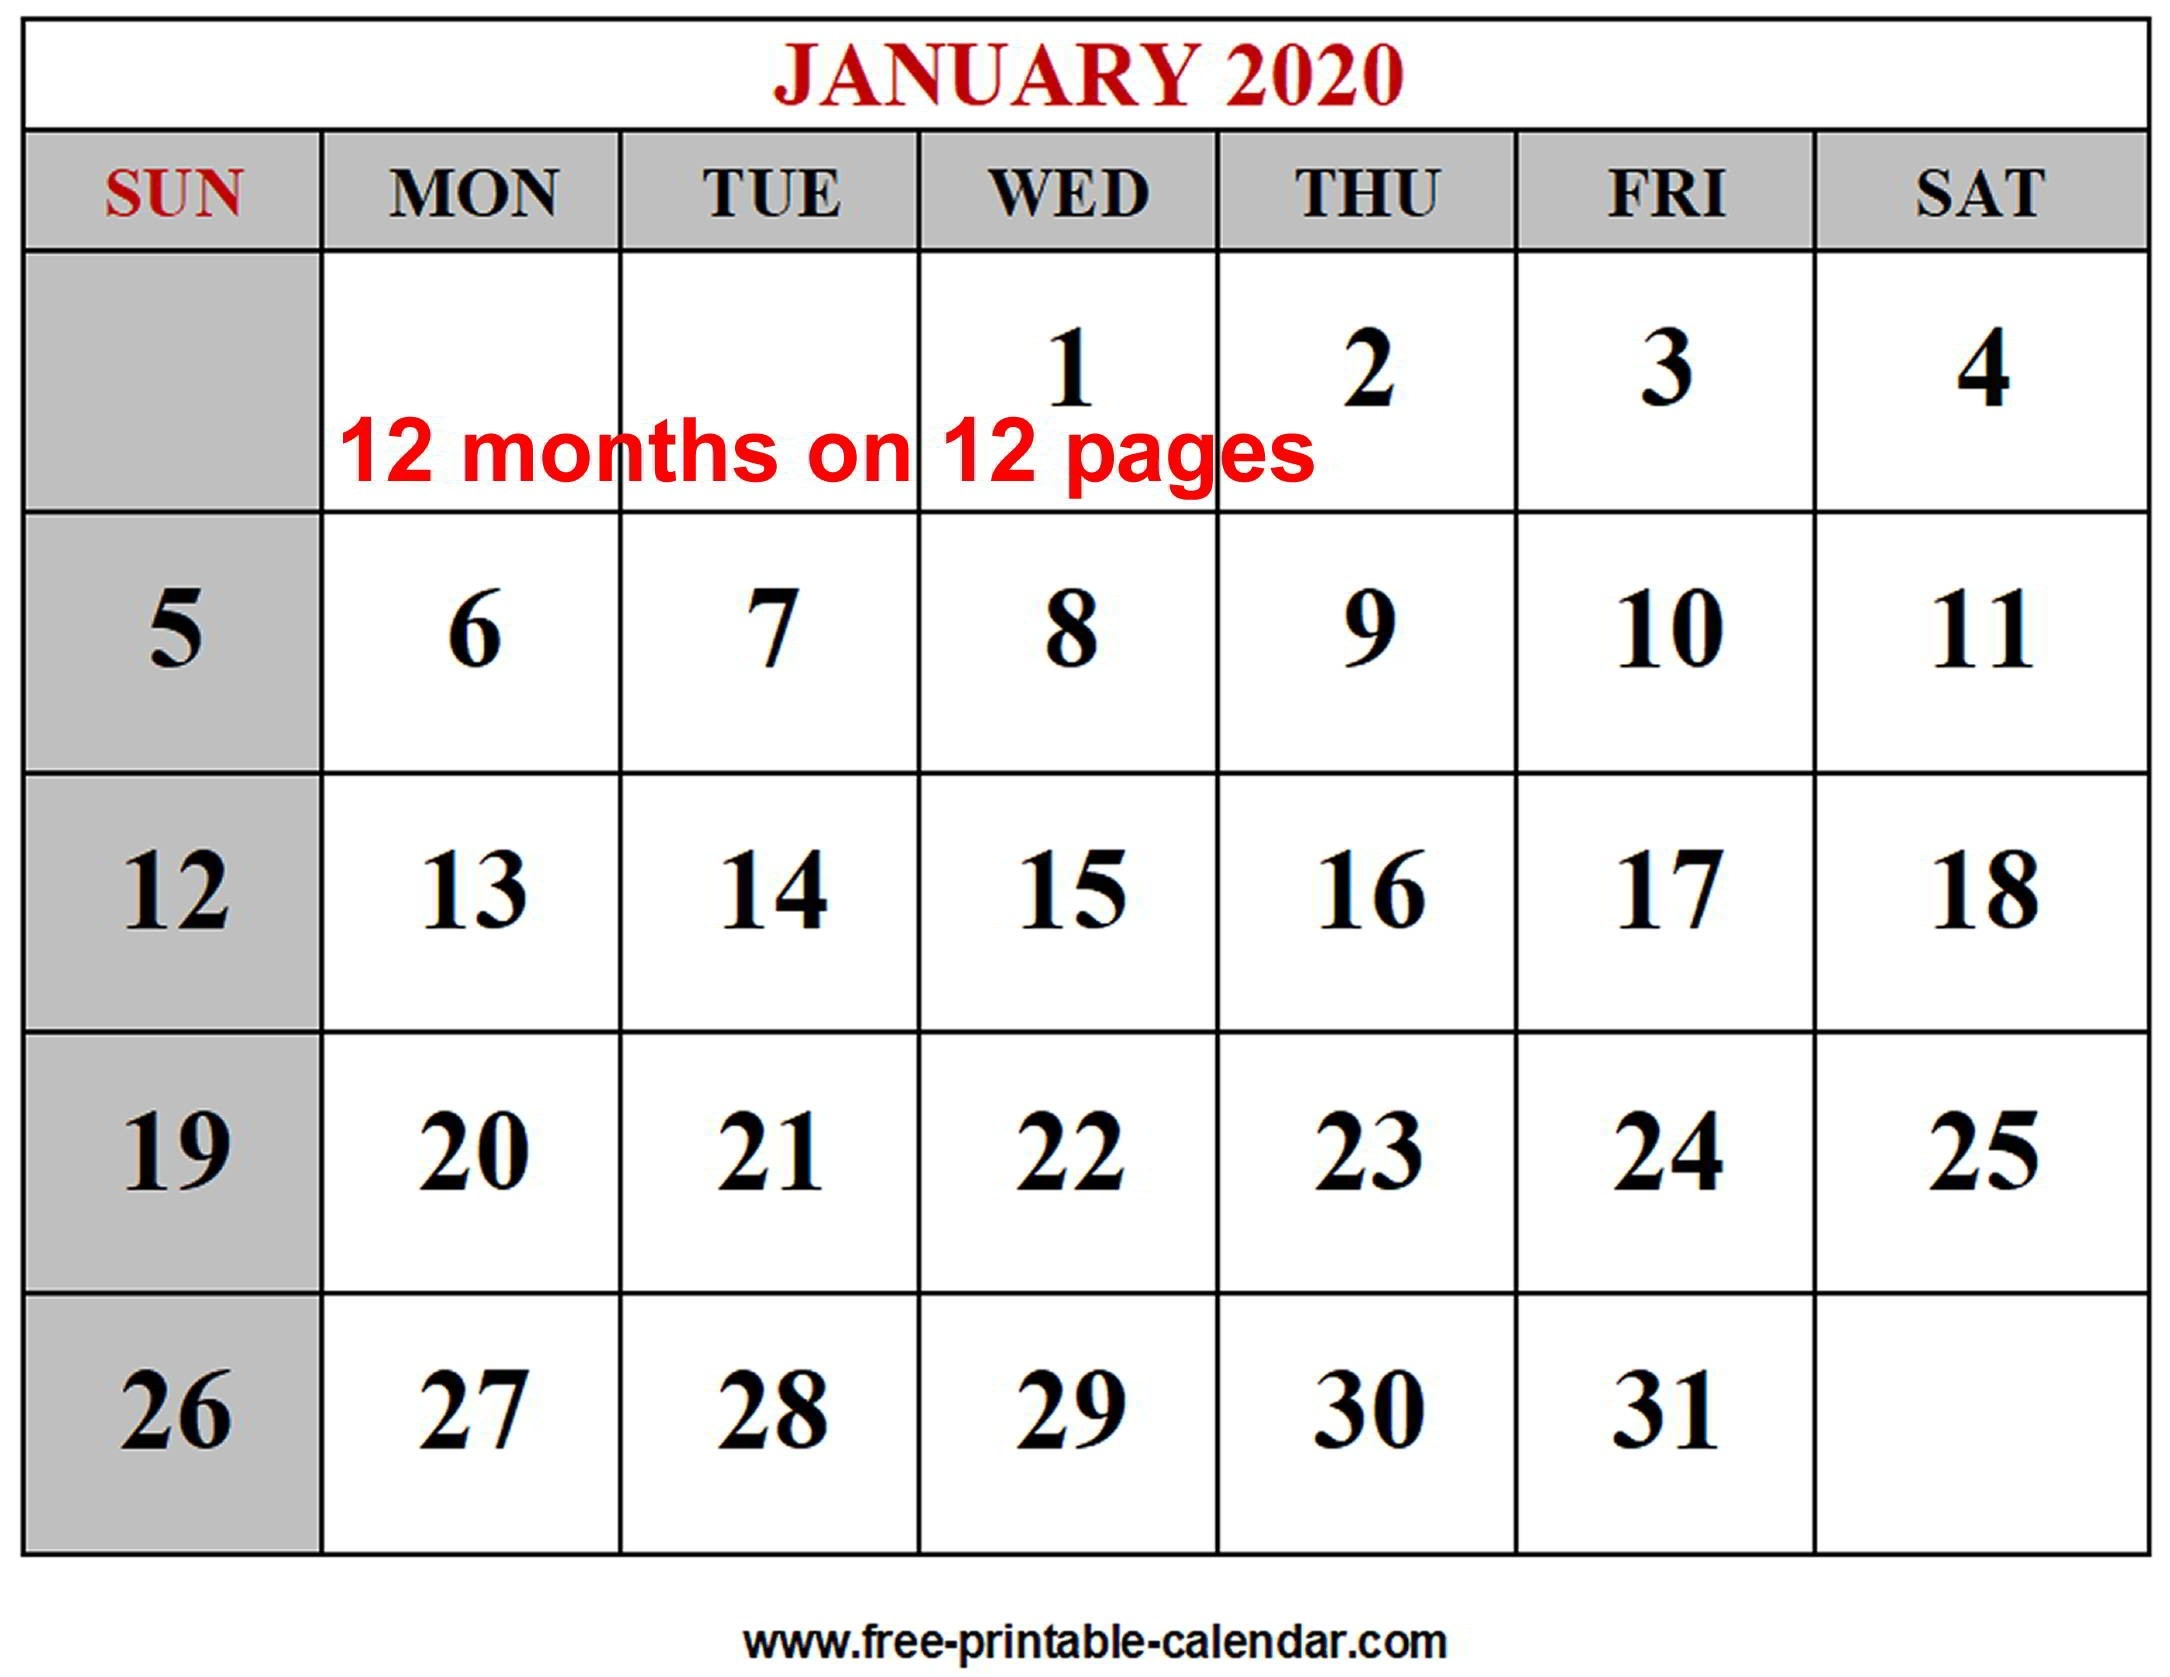 Year 2020 Calendar Templates - Free-Printable-Calendar  Free Printable Calendar 12 Months